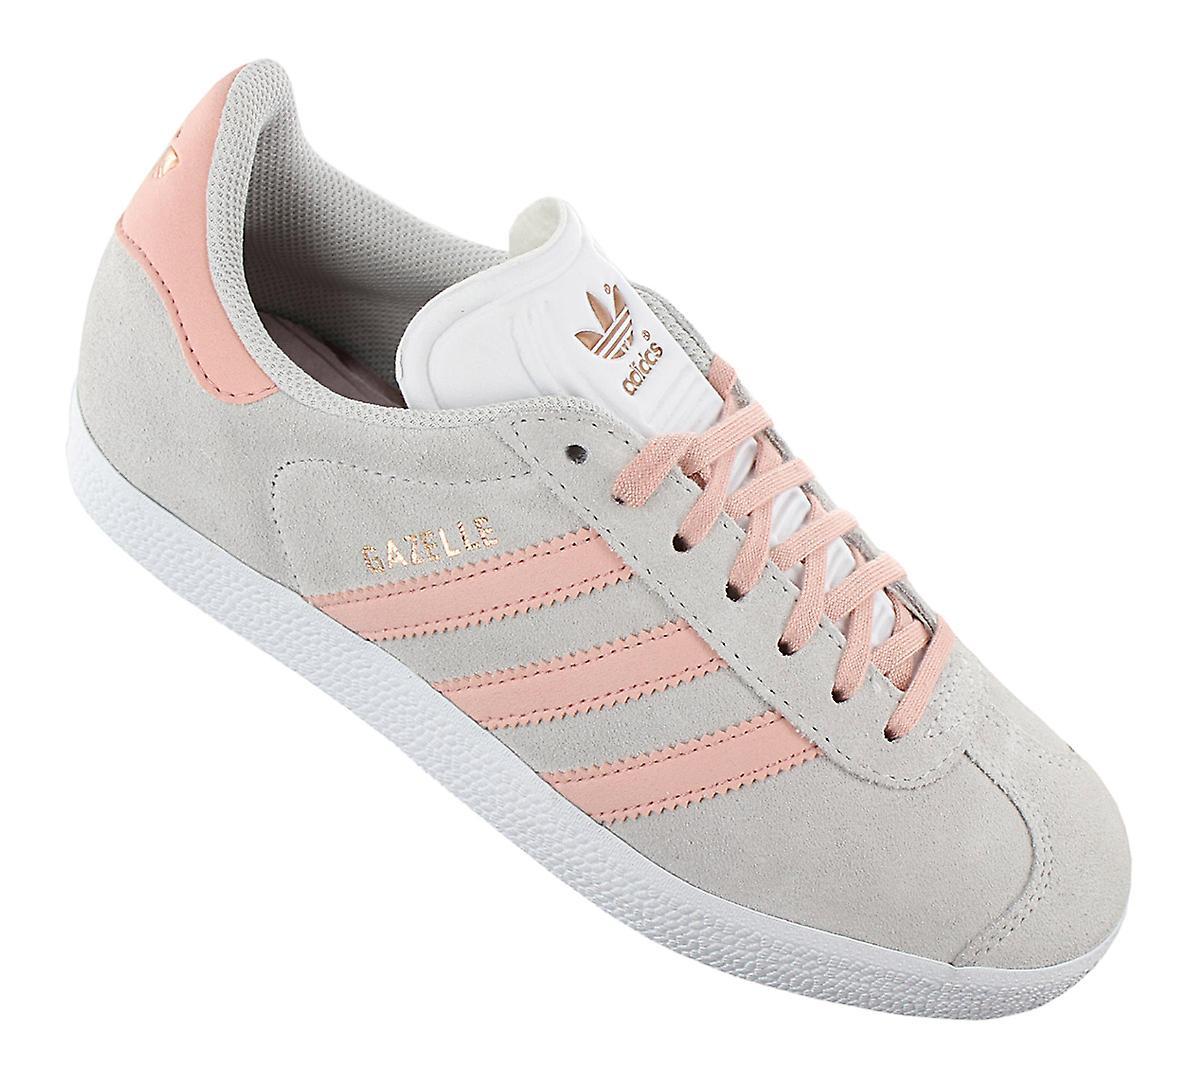 Adidas Originals Gazelle W Damen Schuhe Rosa F36950 Sneakers Sportschuhe